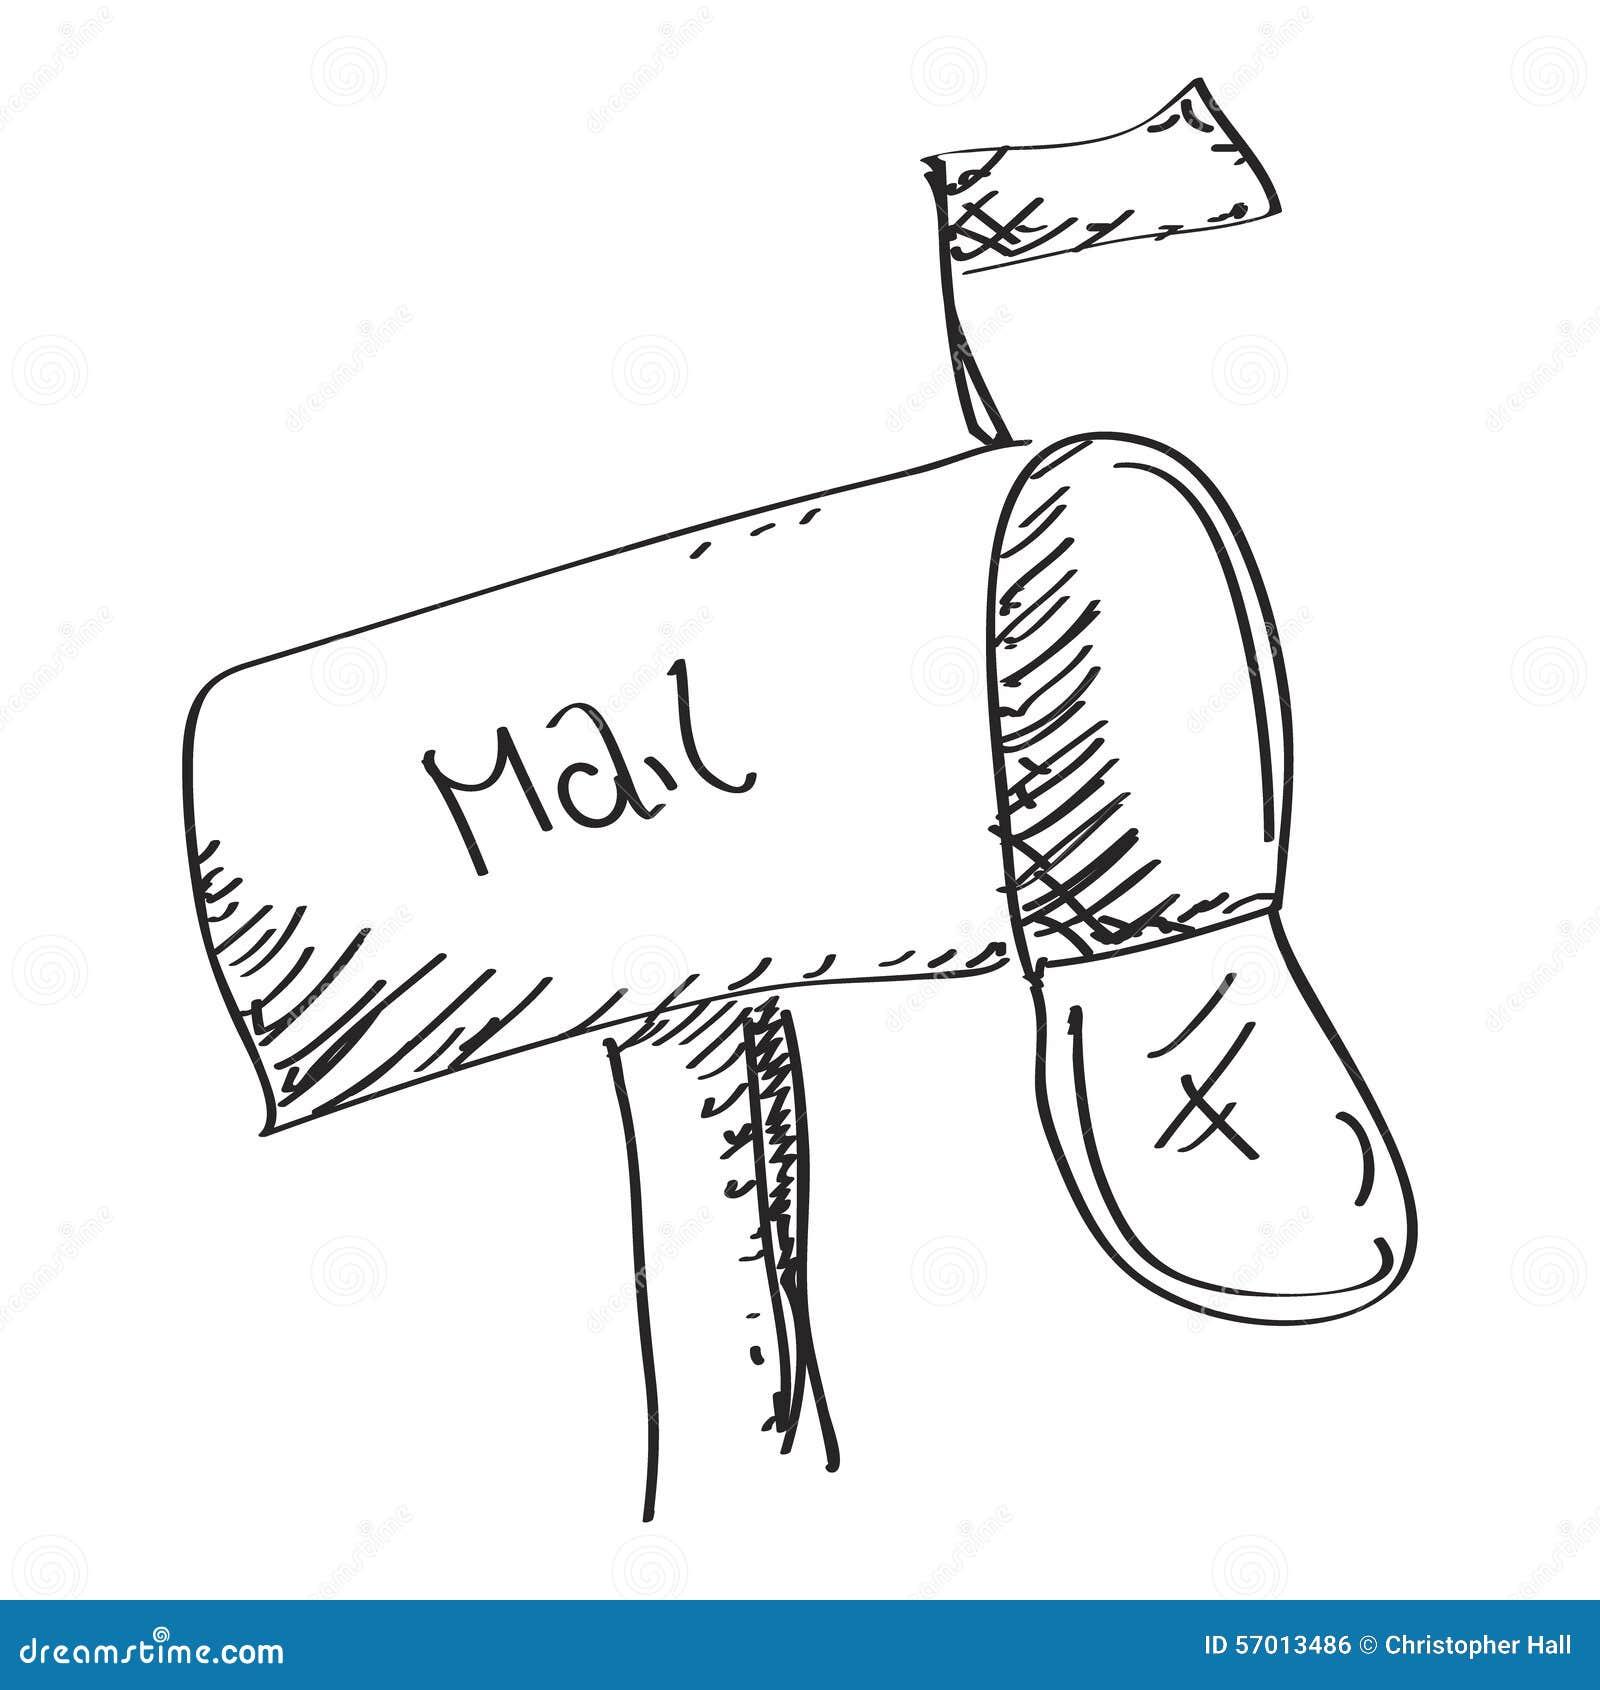 Simple Doodle Of A Mailbox Cartoon Vector | CartoonDealer.com #57000479